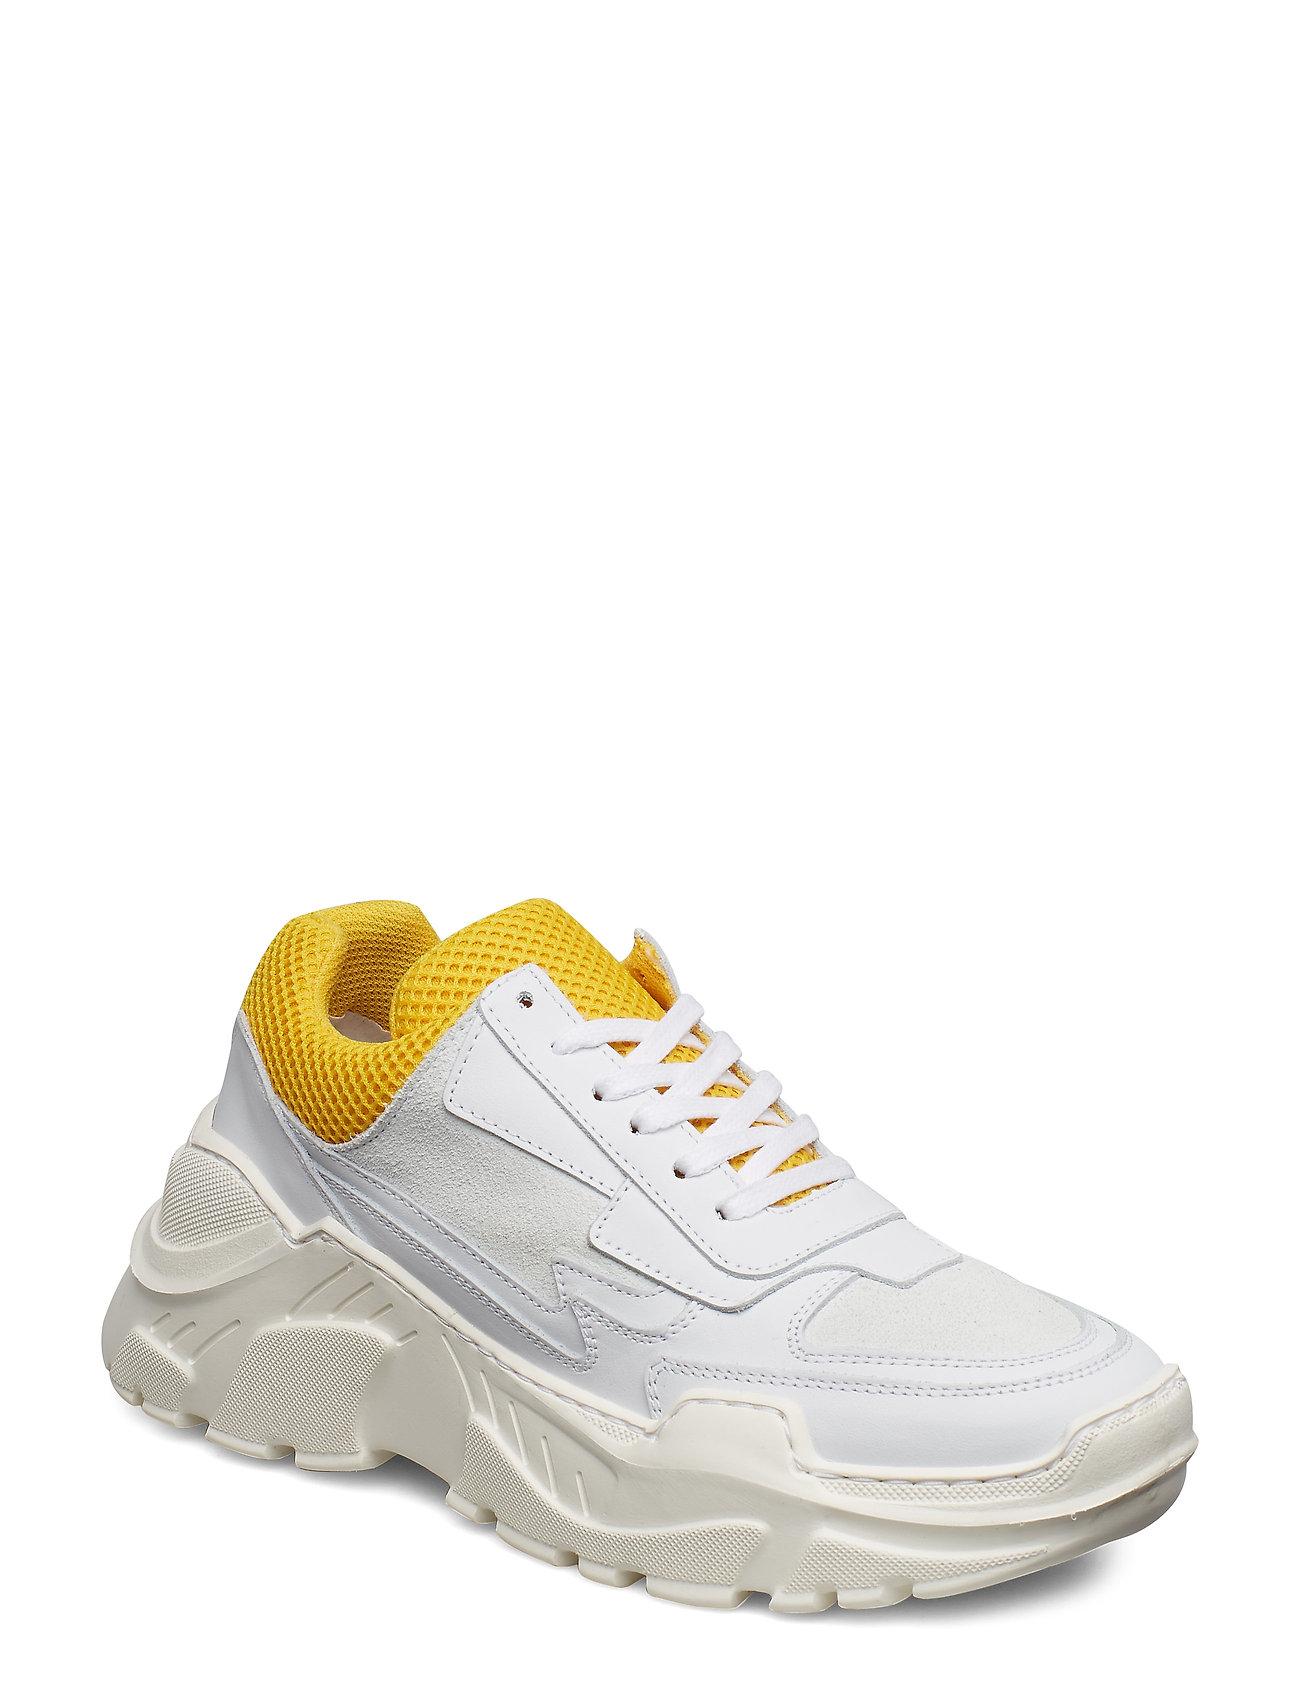 Image of Brenda Mix Low-top Sneakers Hvid Shoe The Bear (3173240653)